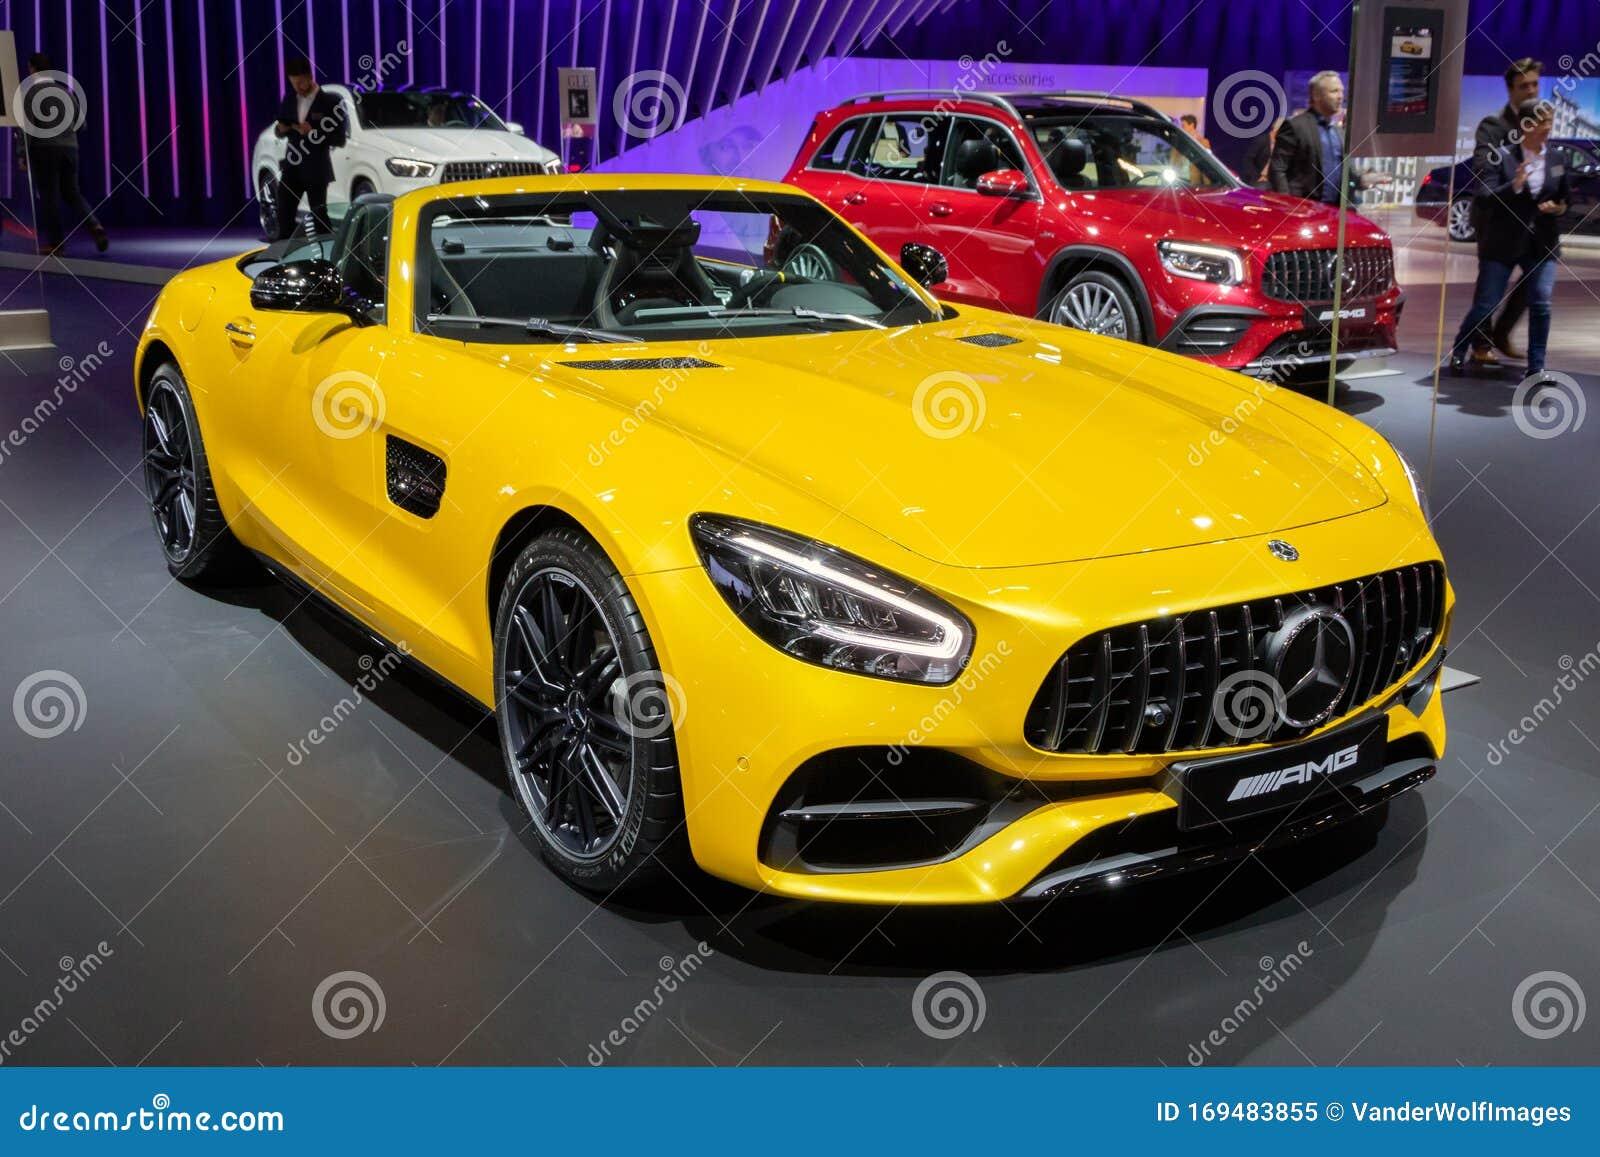 Mercedes Amg Gt Roadster Sports Car Editorial Image Image Of Model Motorshow 169483855